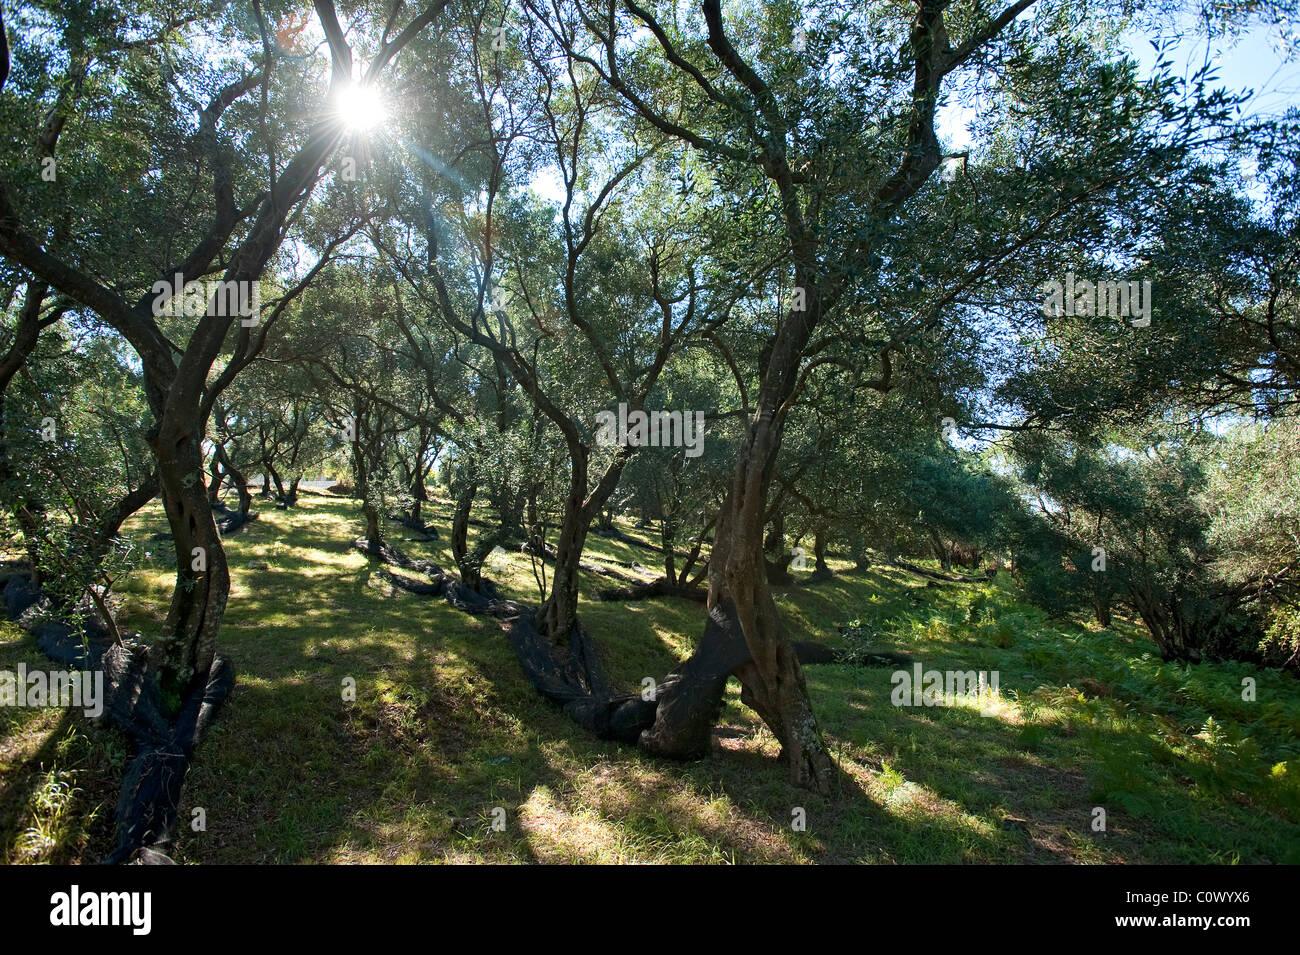 Olive Grove, Corfu, Ionian islands, Greece - Stock Image